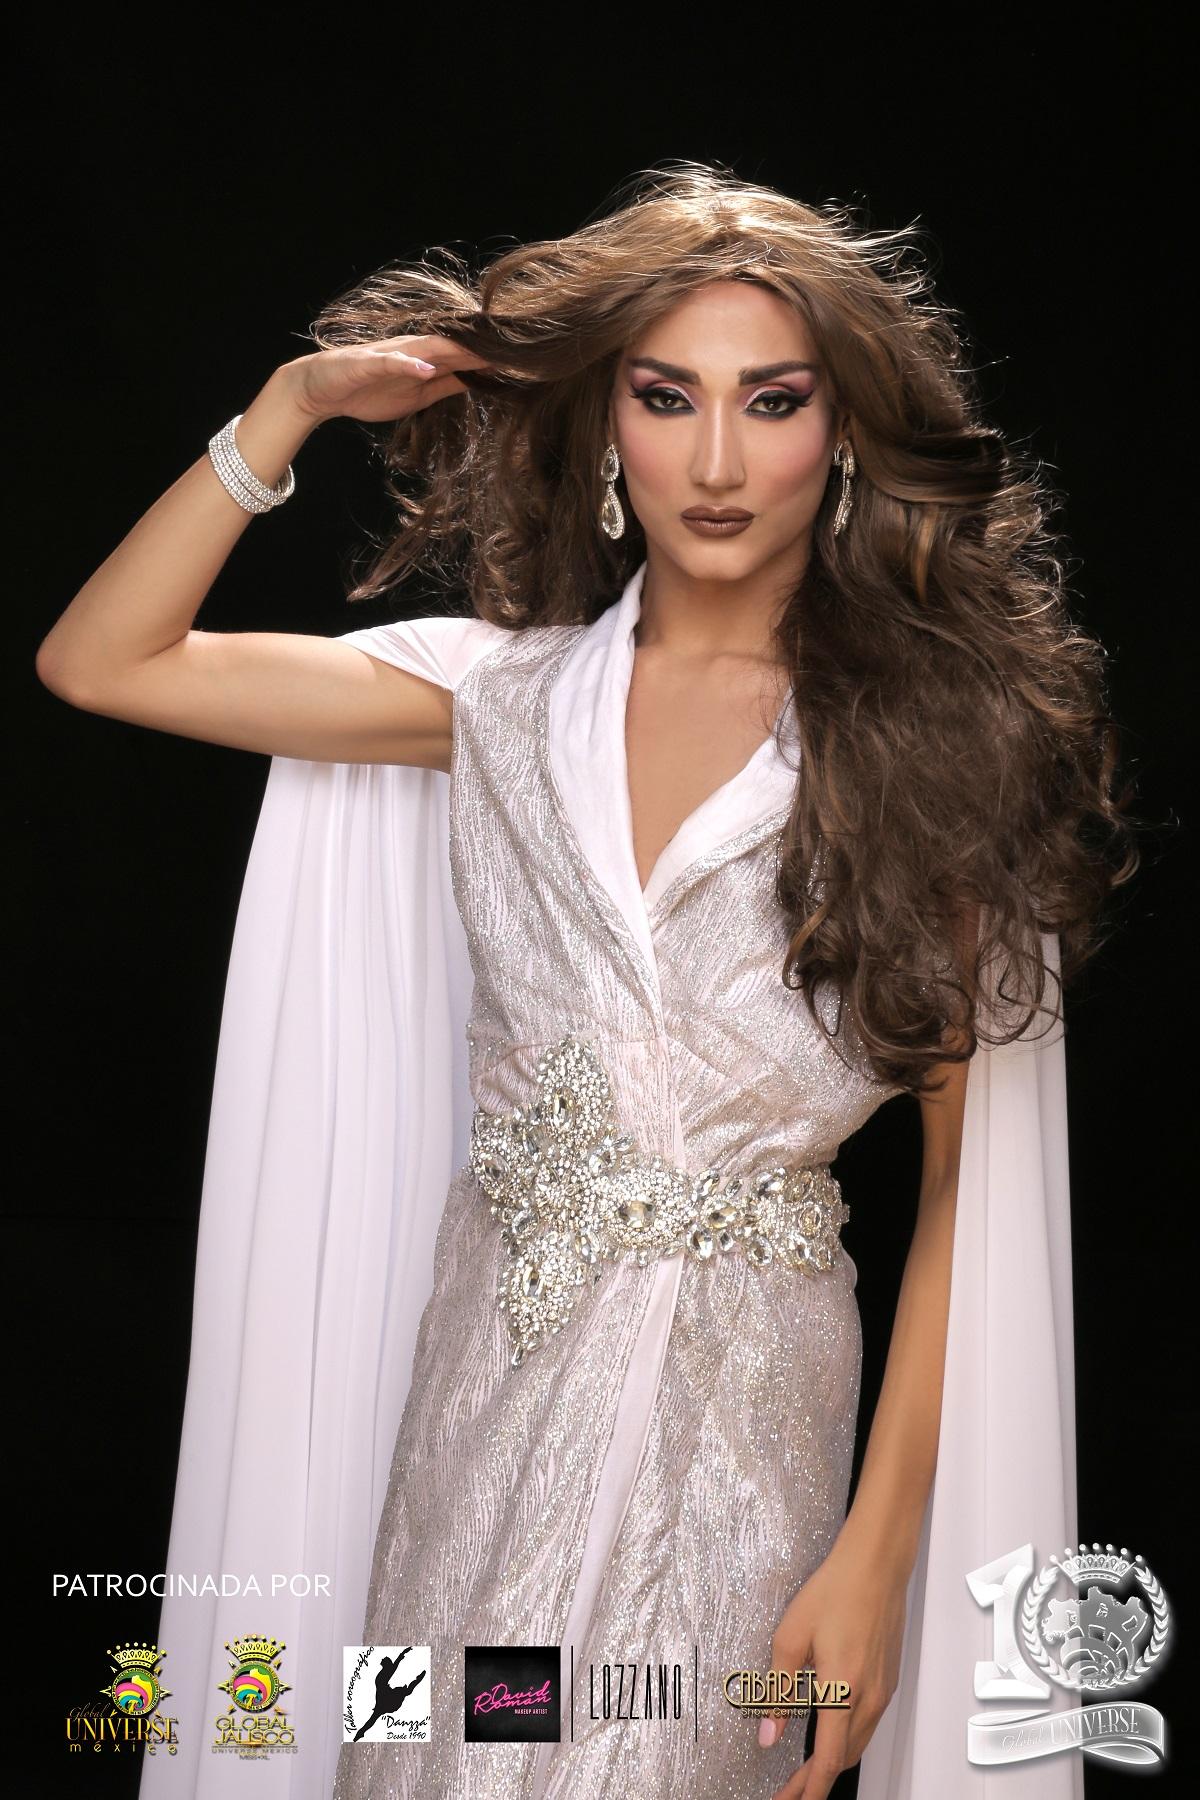 Representante de Regular México en Global Universe, Andonni Yunoem